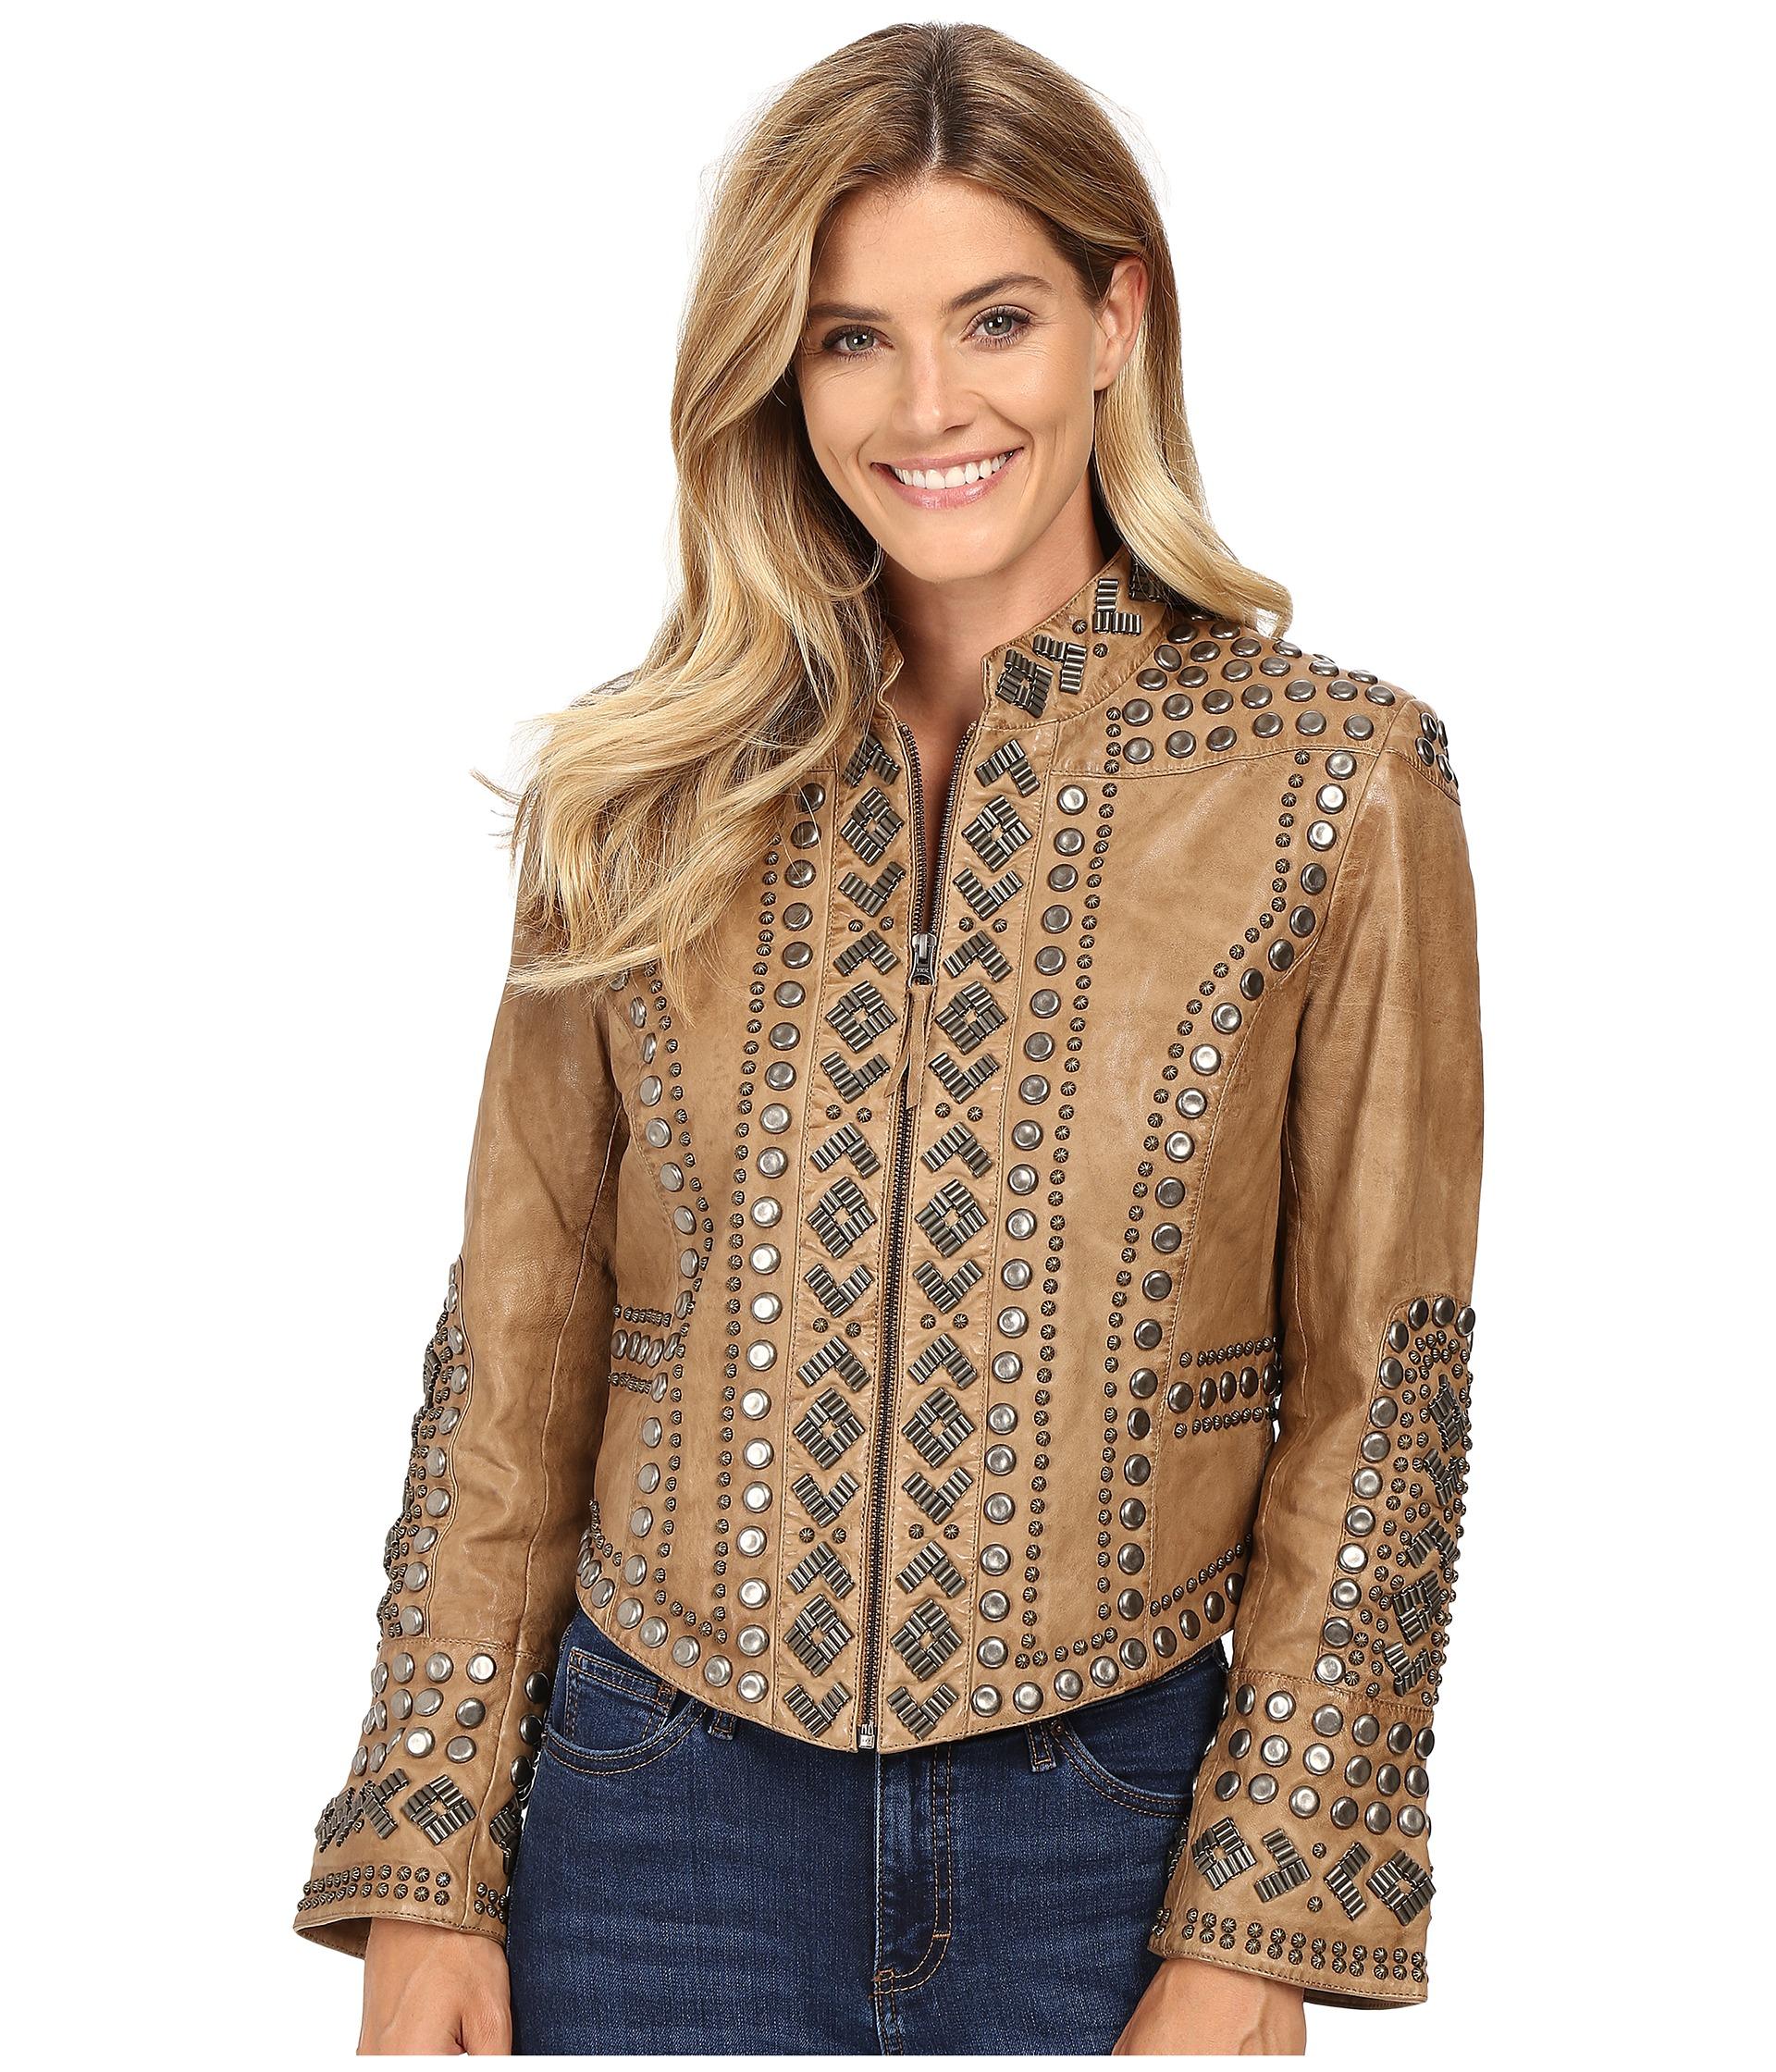 Double d ranchwear leather jacket